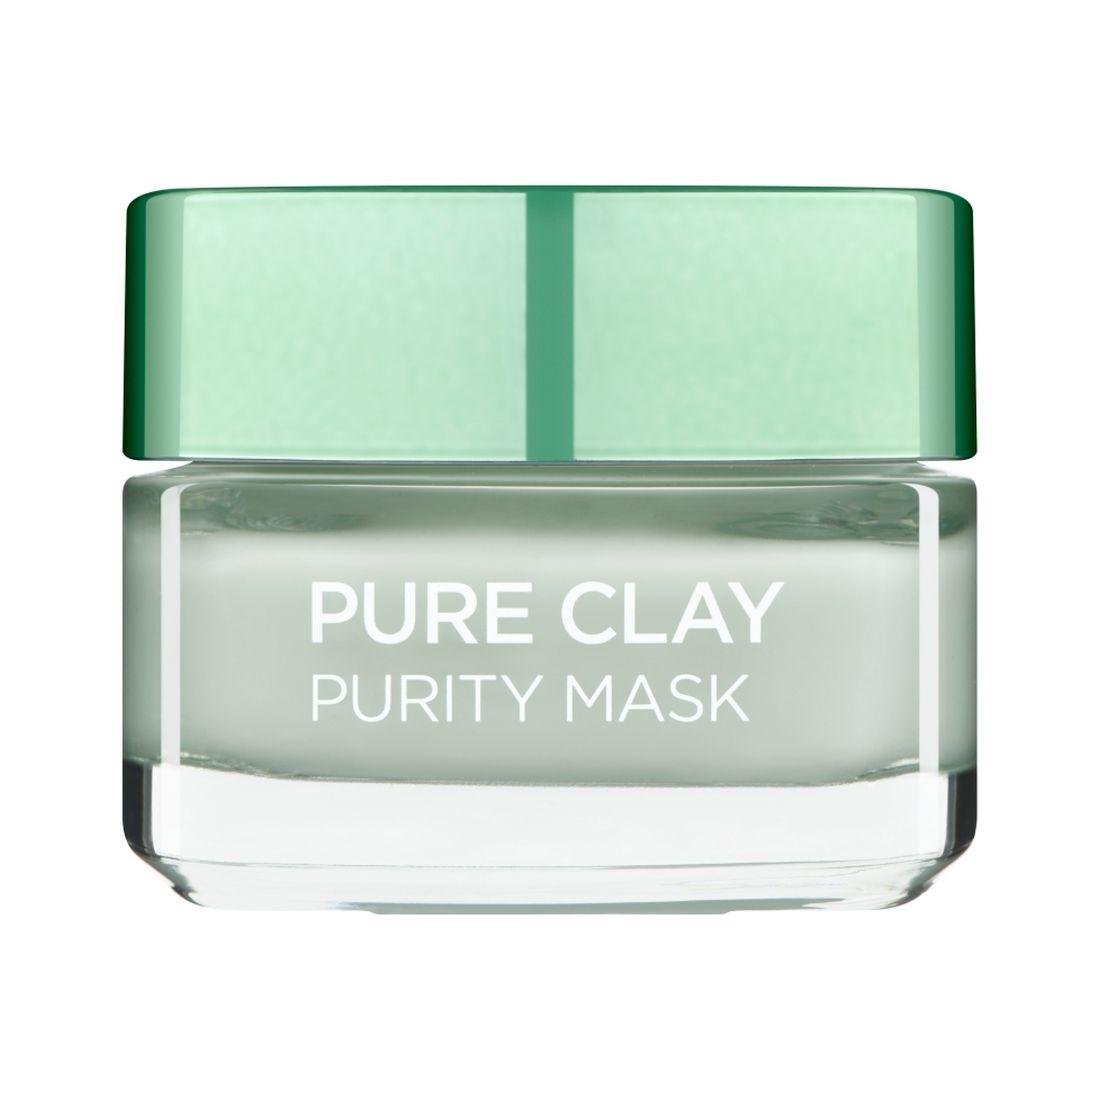 L'Oréal Masque Argile Purity 50ml Τύπος Δέρματος : Όλοι οι τύποι